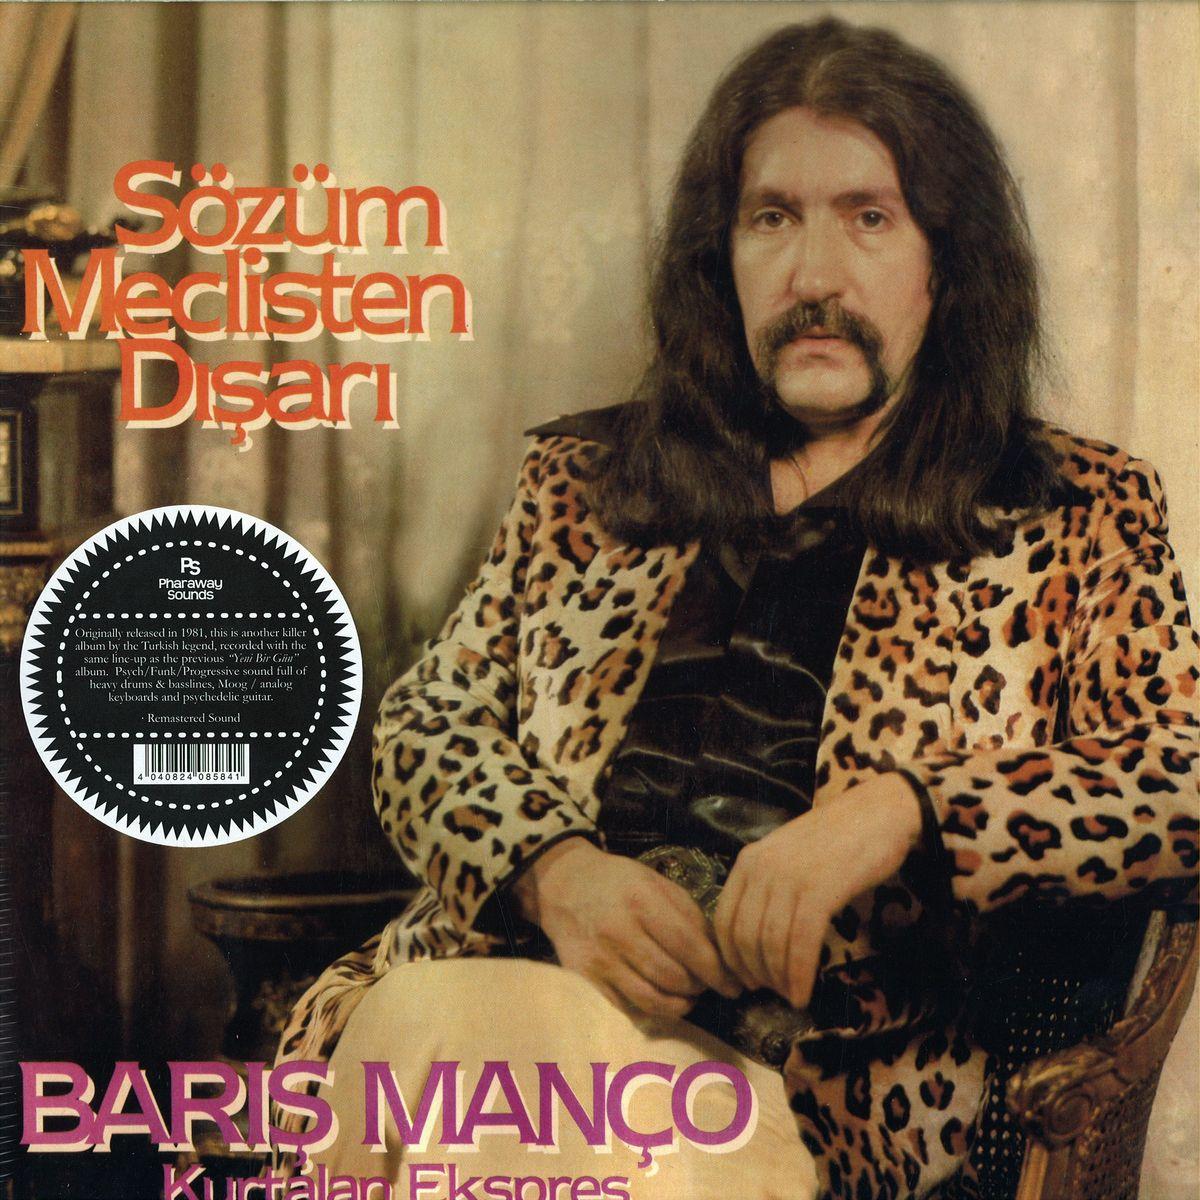 Baris Manco & Kurtalan Ekspres - Sözüm Meclisten Disari [LP]